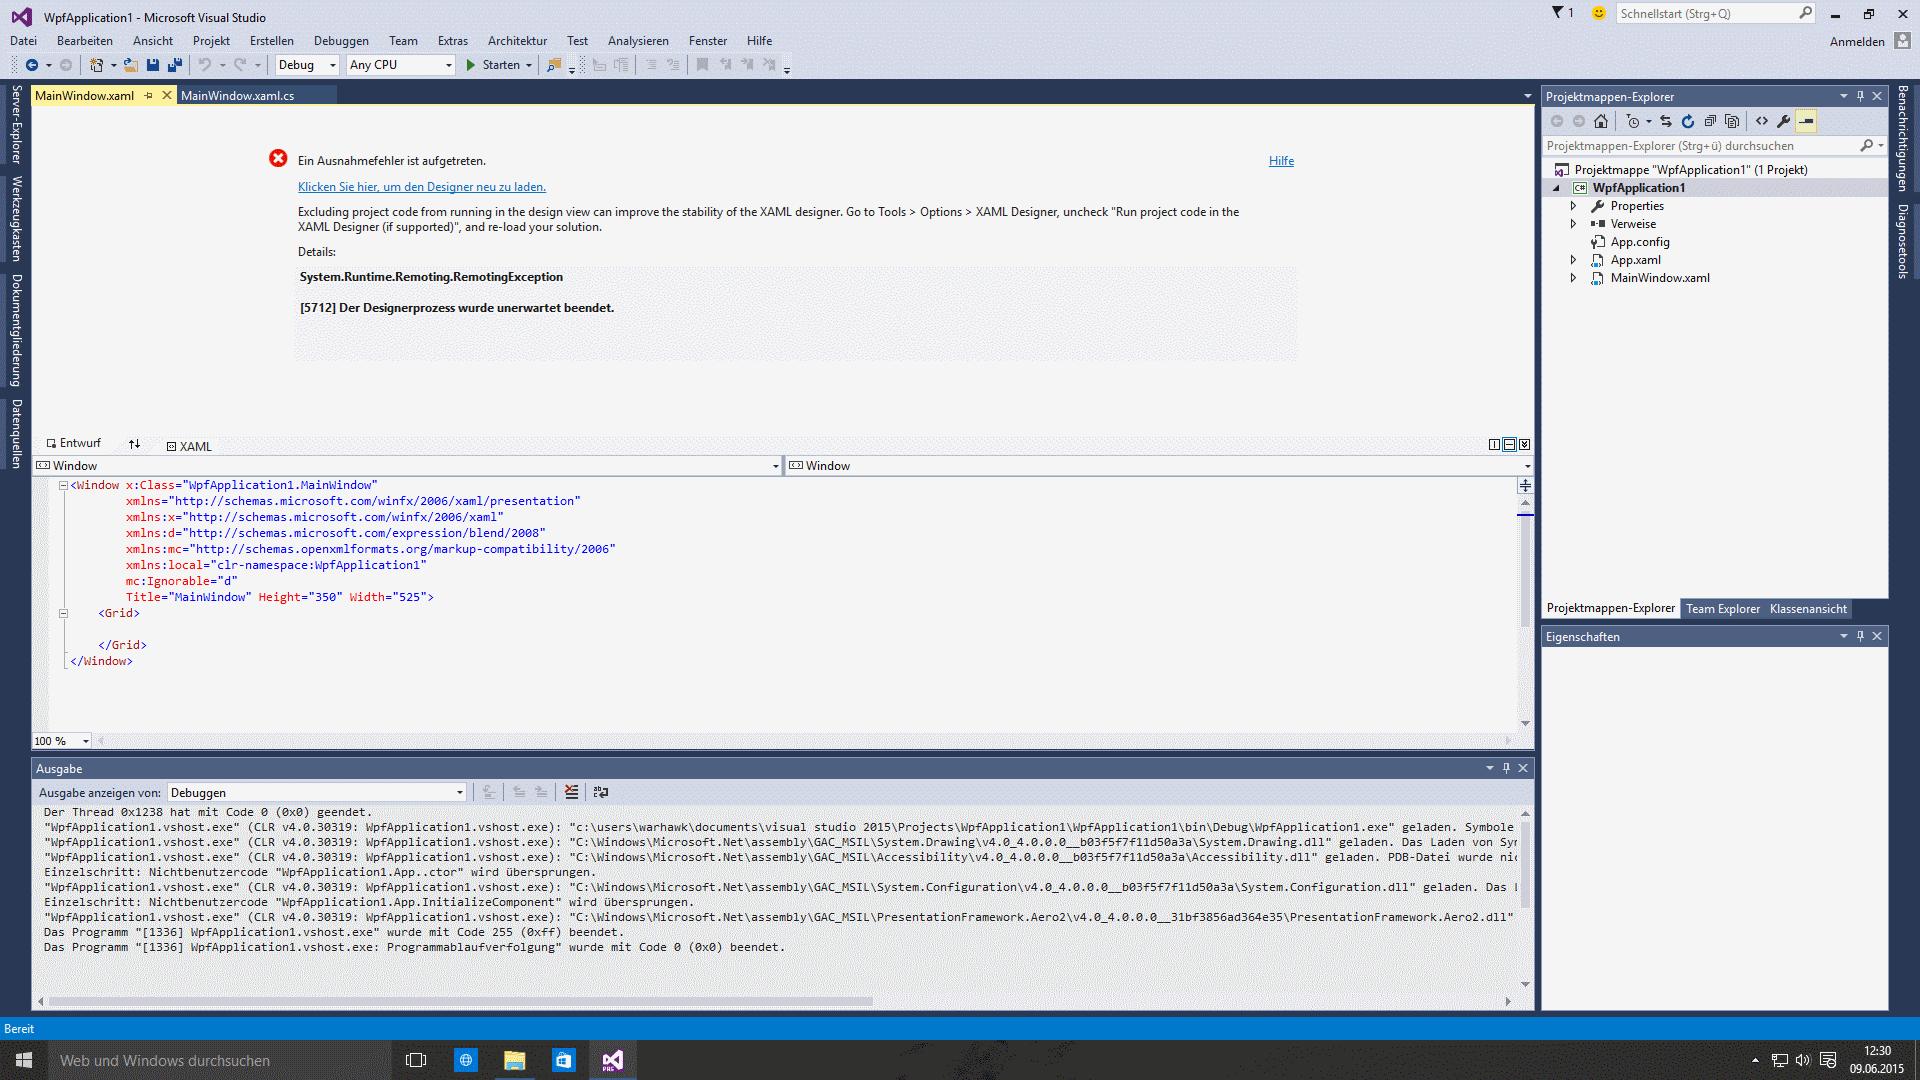 14190 (Starting a WPF-Application under Windows 10130 crash ...